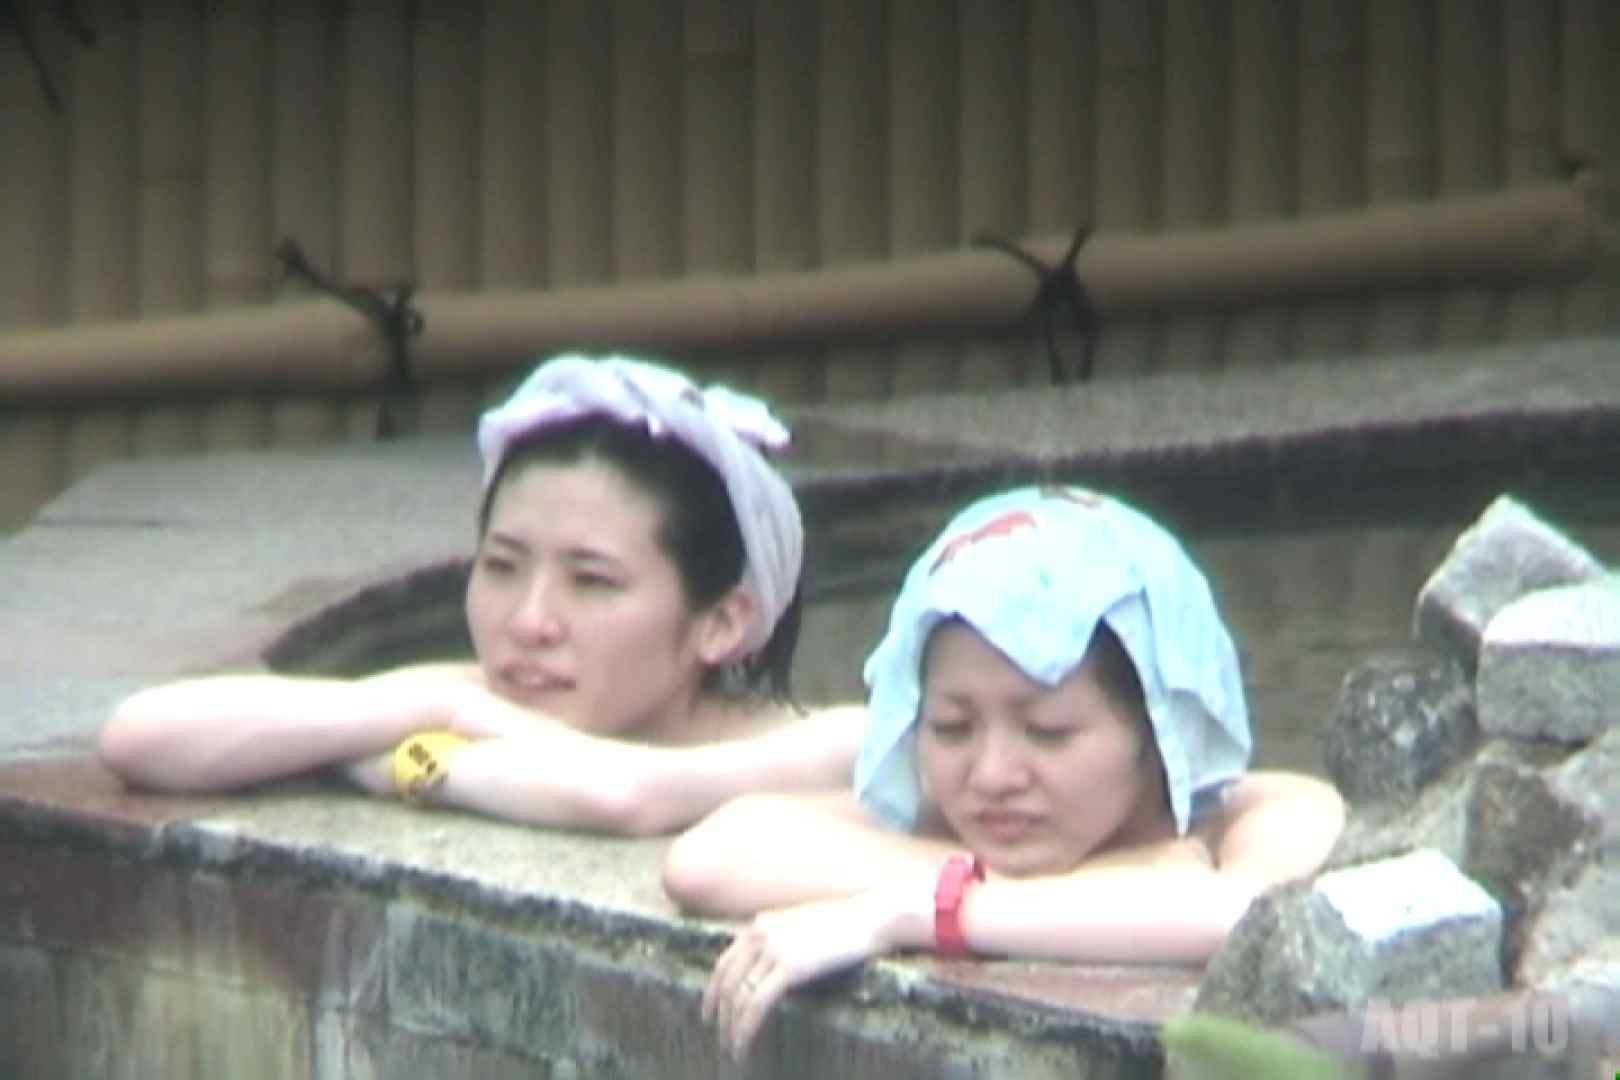 Aquaな露天風呂Vol.793 盗撮特撮  10pic 6